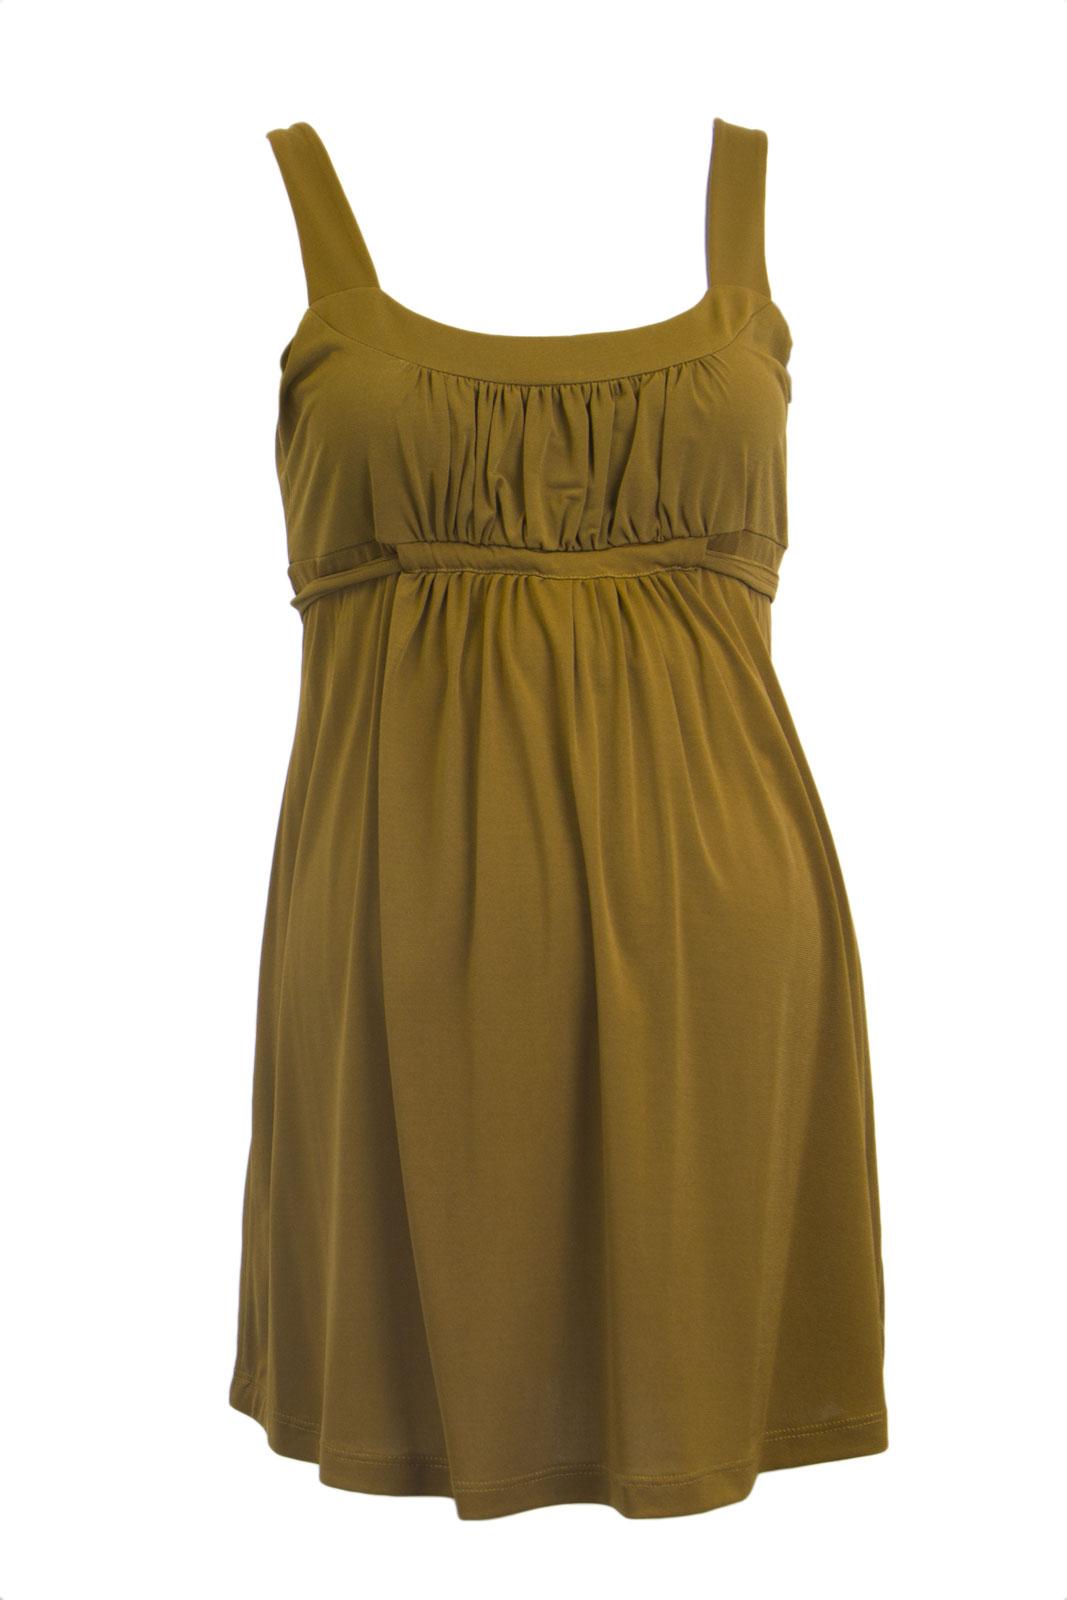 OLIAN Maternity Women's Caramel Self Tie Empire Waist Sleeveless Top